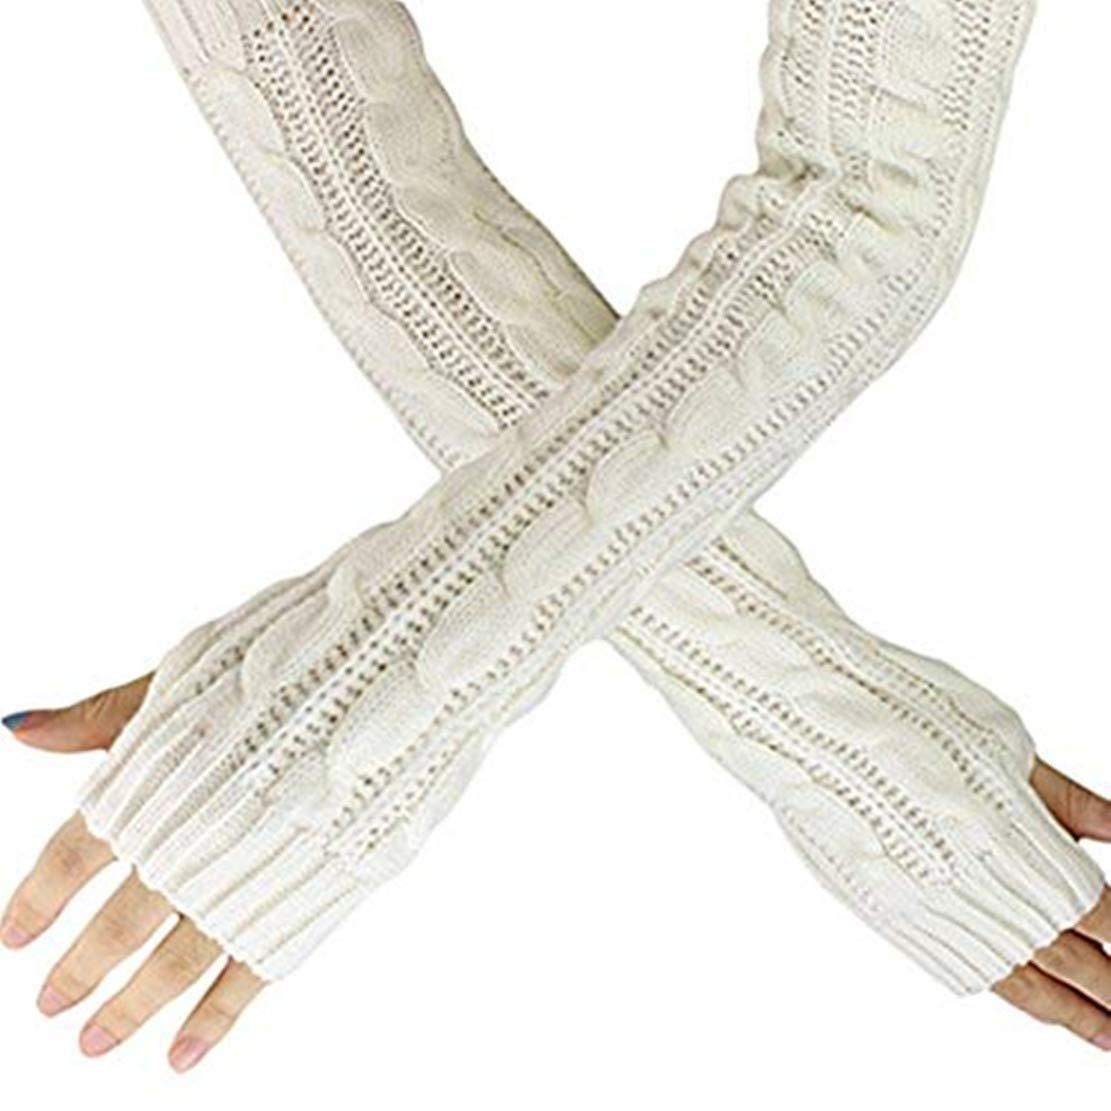 Likecrazy Damen Herbst Winter Handschuhe Lange Armstulpen Handschuhe Skalen Design F/äustlinge Frauen Winter lange Halbhandschuhe gestrickt Armstulpen Damen Arm Pulsw/ärmer